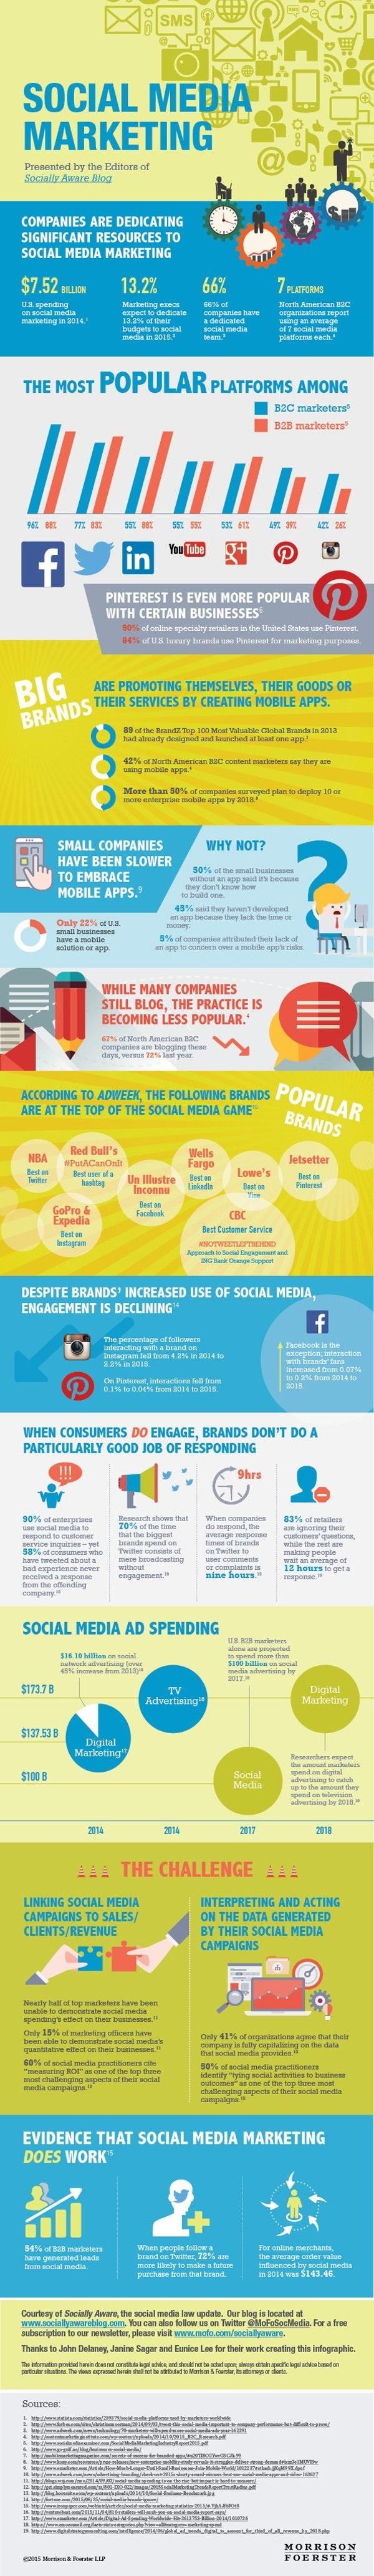 160104-social-media-marketing-infographic